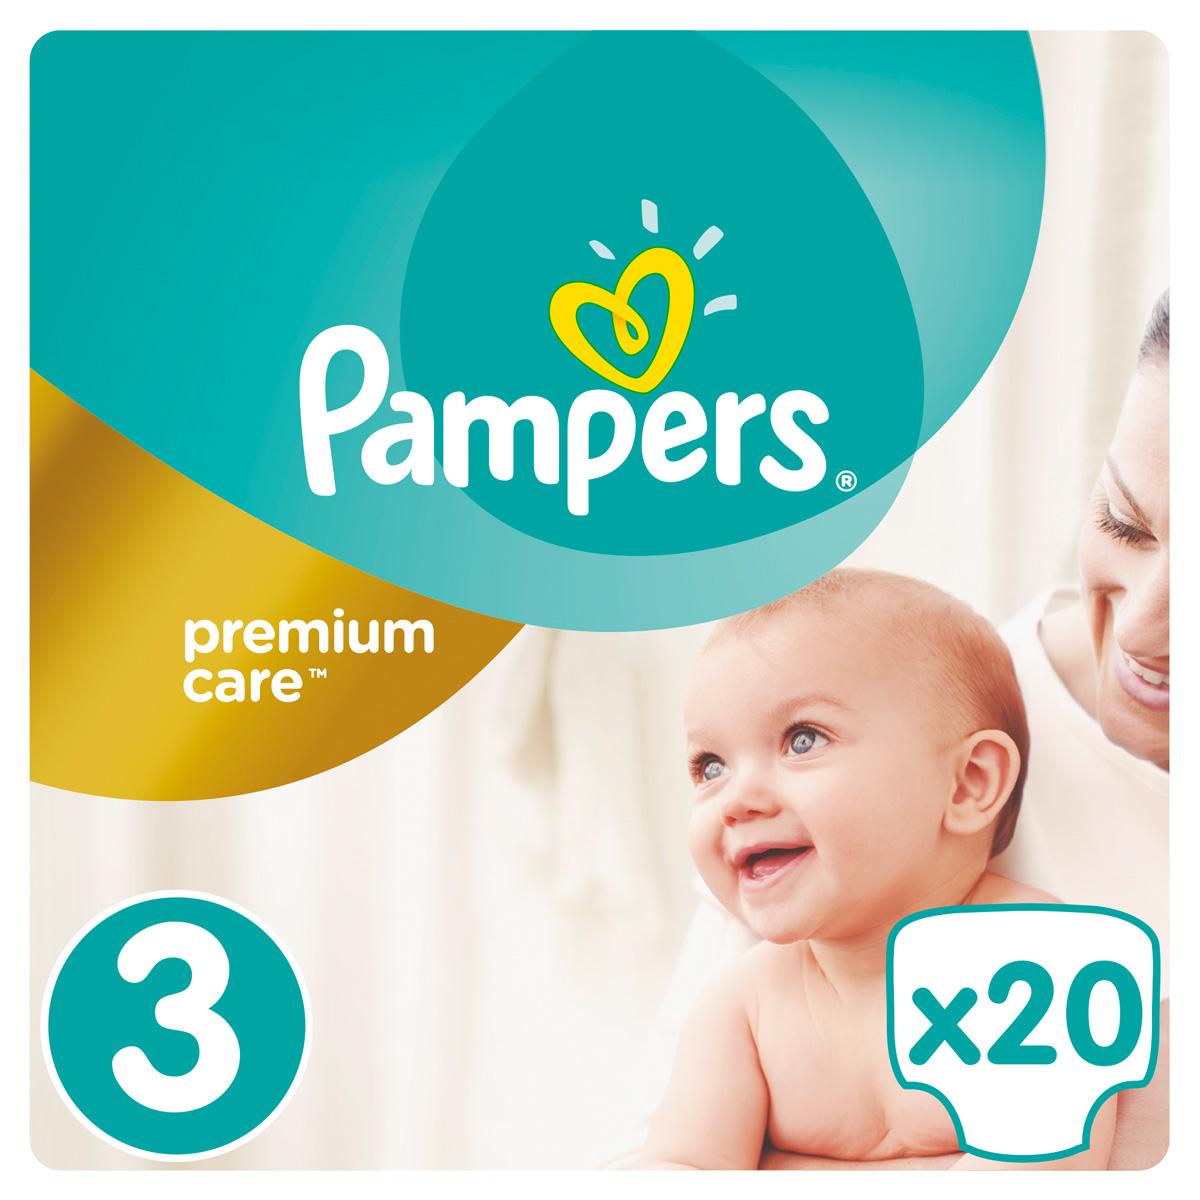 Pampers Подгузники Premium Care 5-9 кг (размер 3) 20 шт подгузники детские pampers подгузники pampers premium care 3 6 кг 96 шт